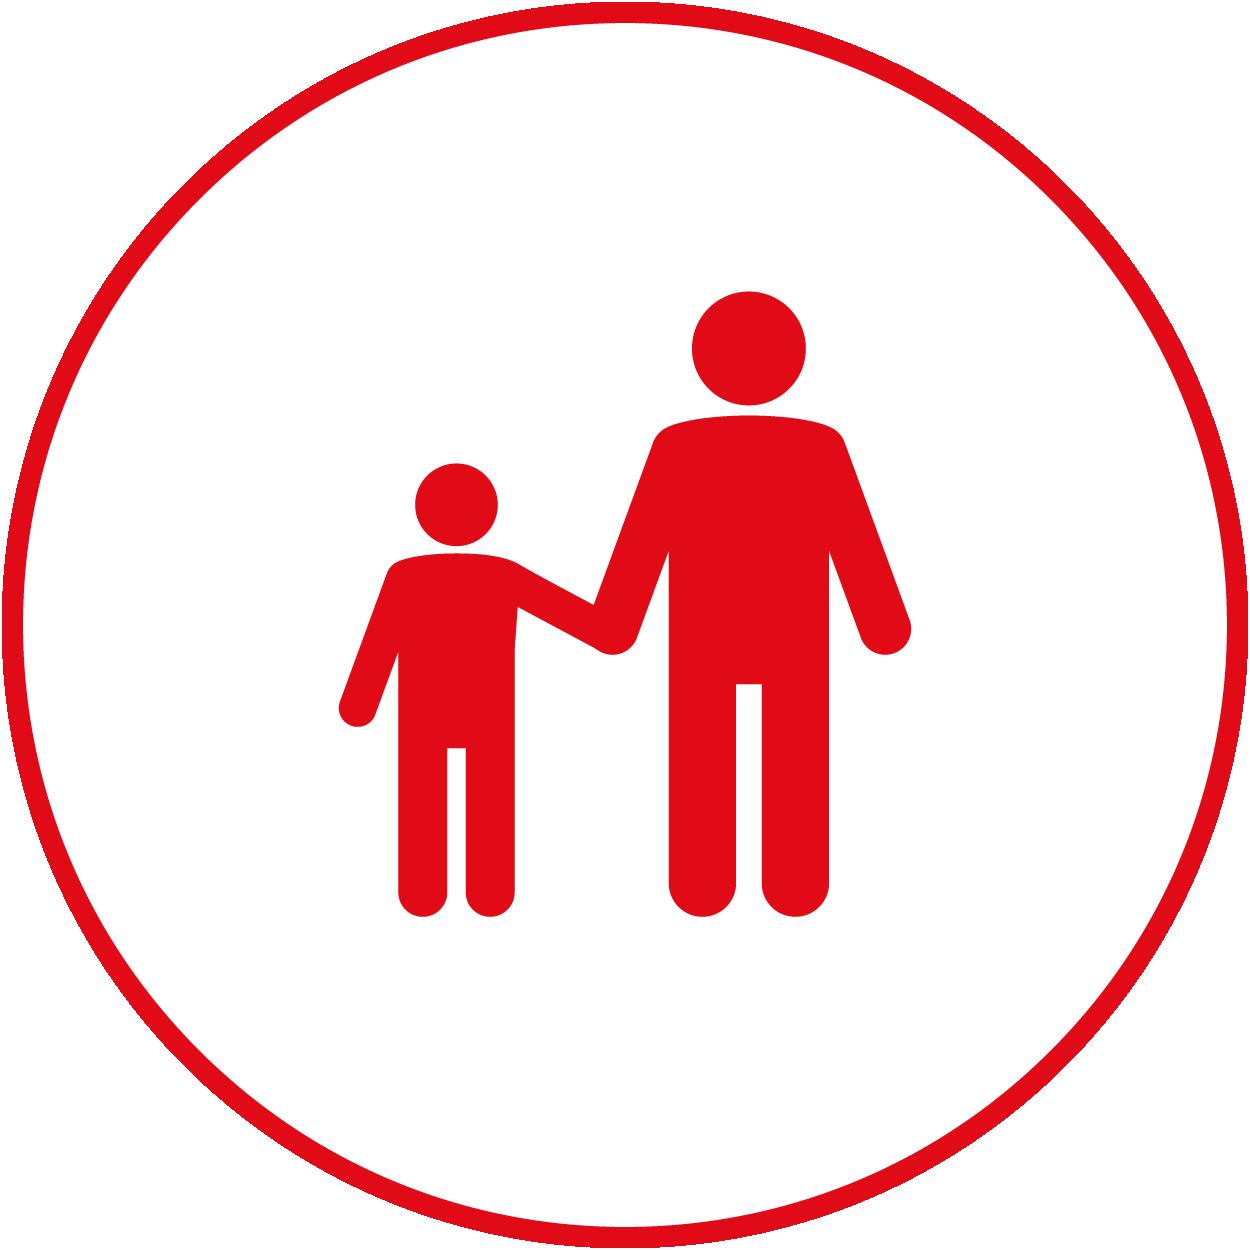 Børnsocial Arv Dsu